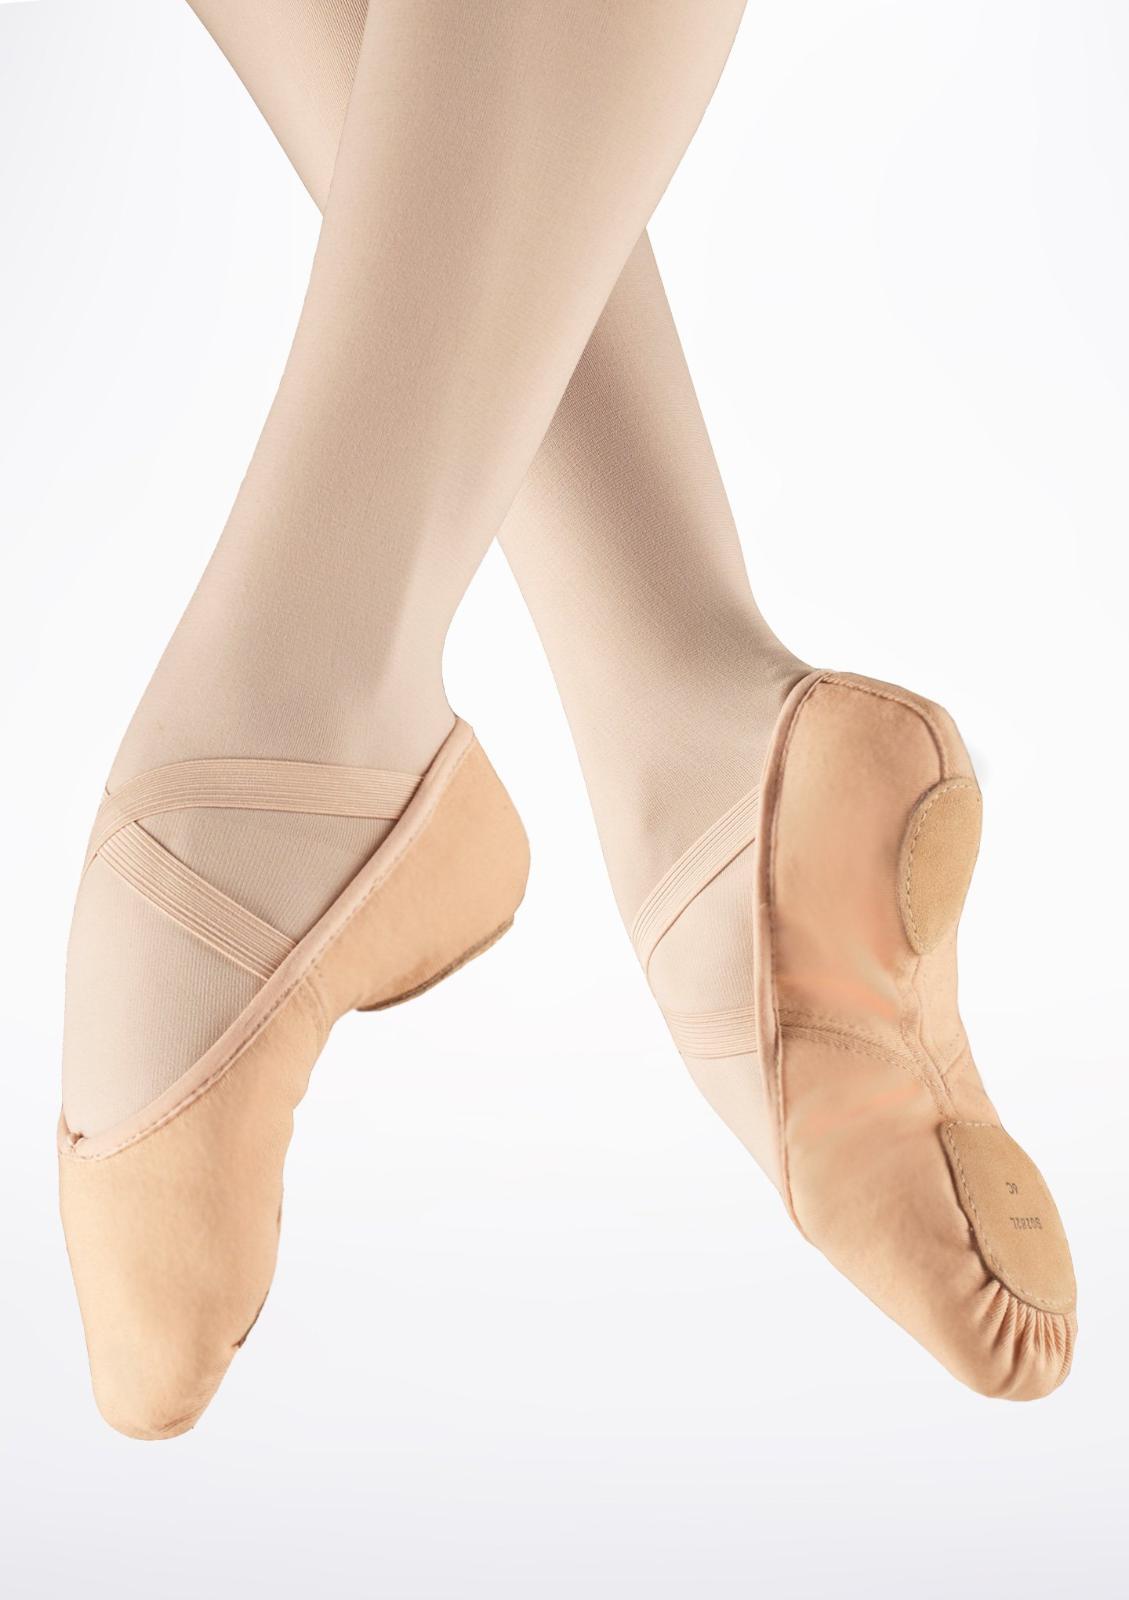 Pink Bloch canvas Zenith split sole ballet shoes -all sizes S0282